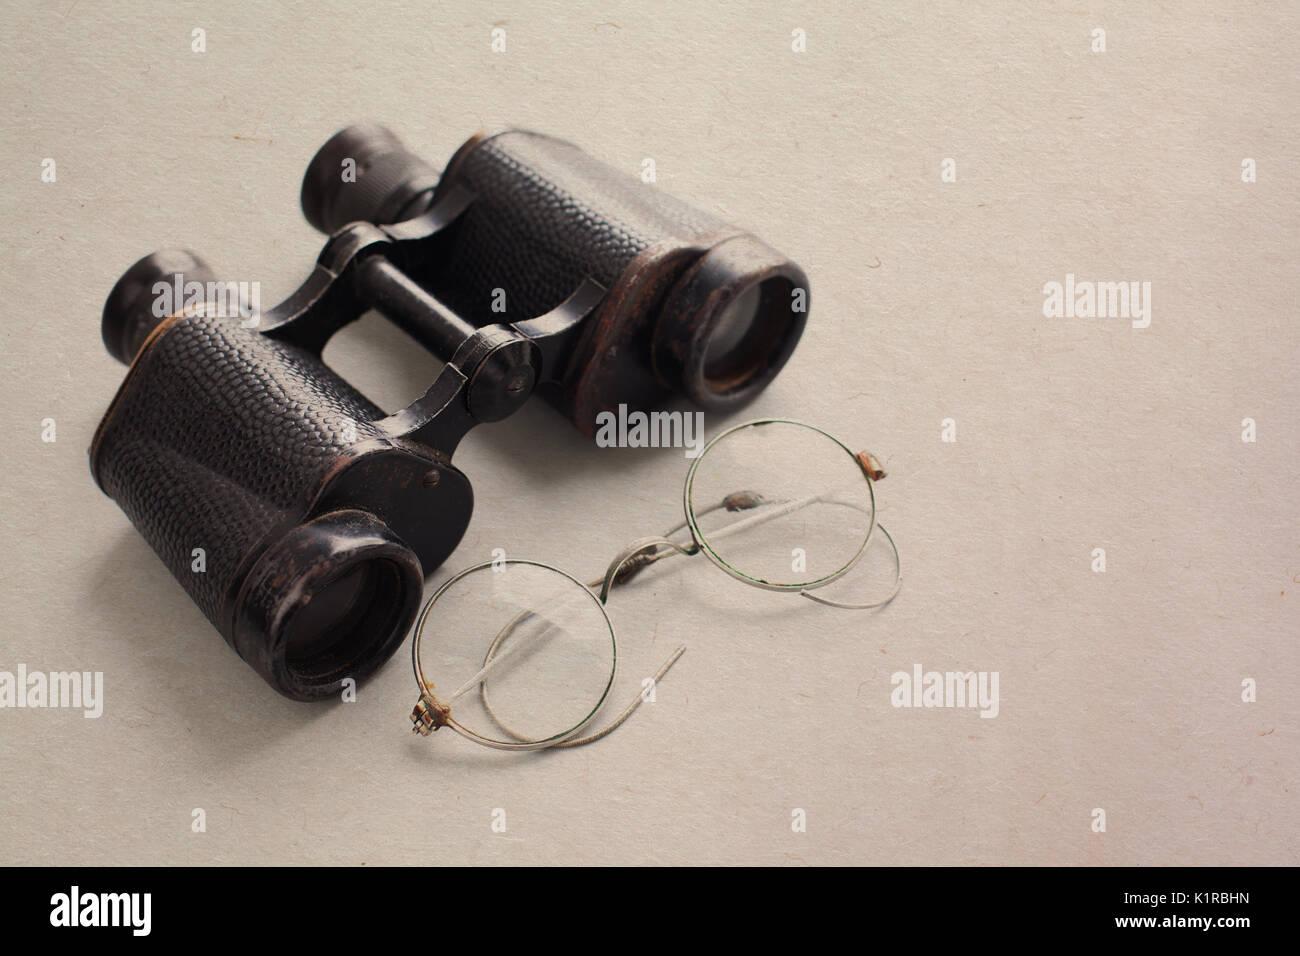 binocular and glasses - Stock Image